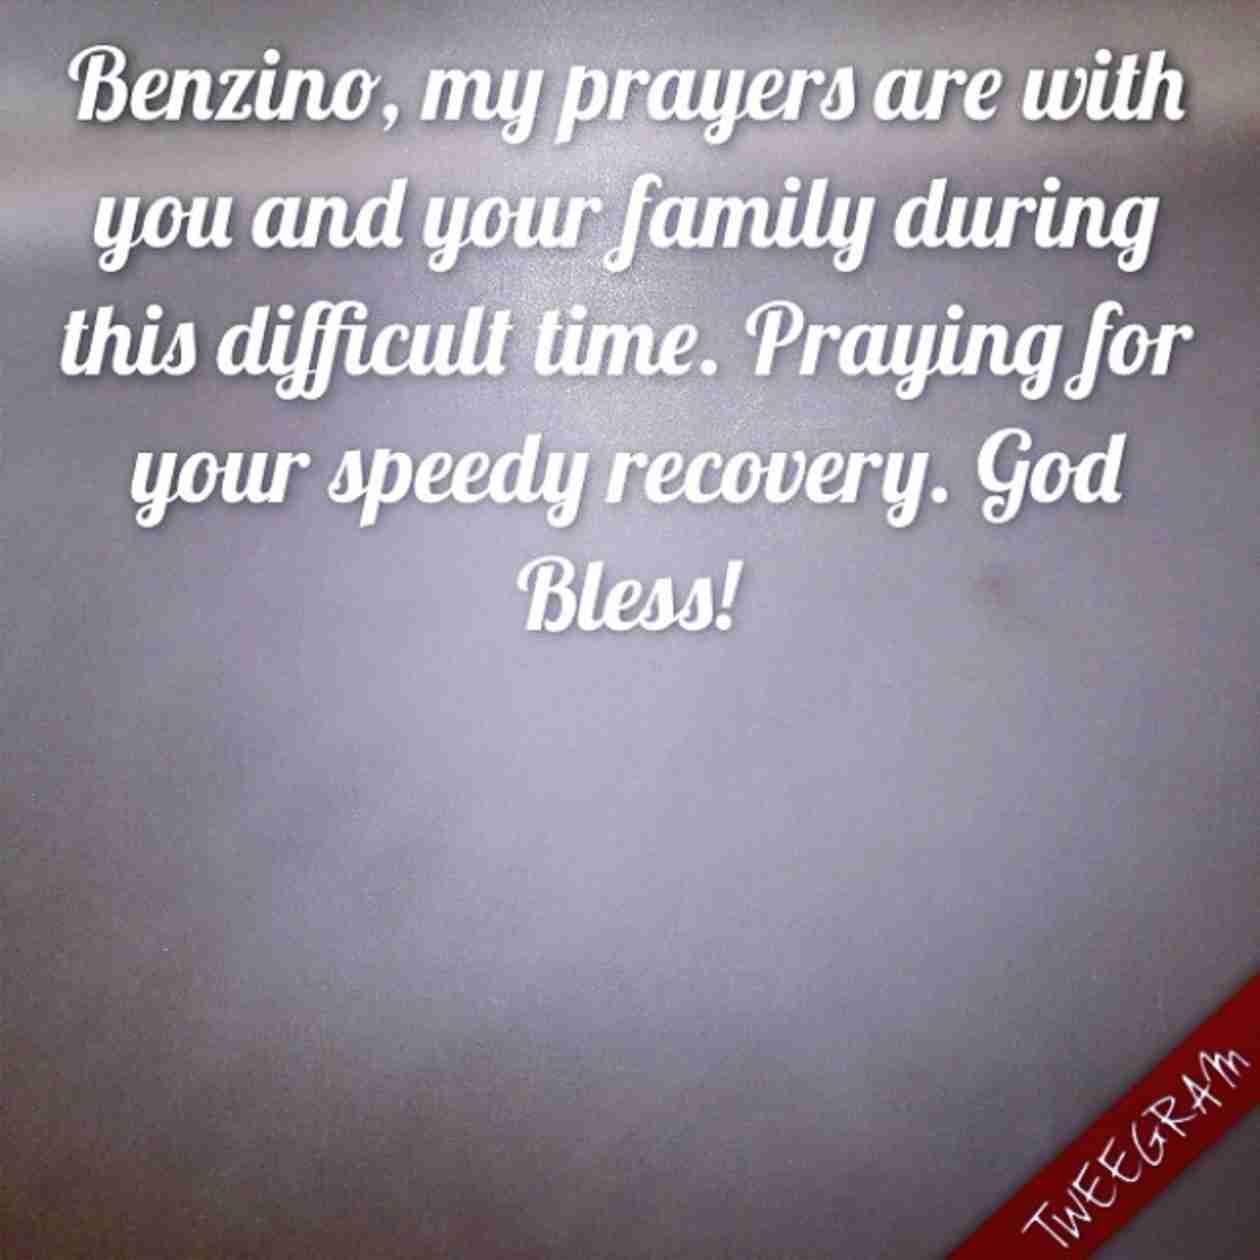 Karlie Redd Sends Well Wishes to Recently Injured Ex Benzino (PHOTO)